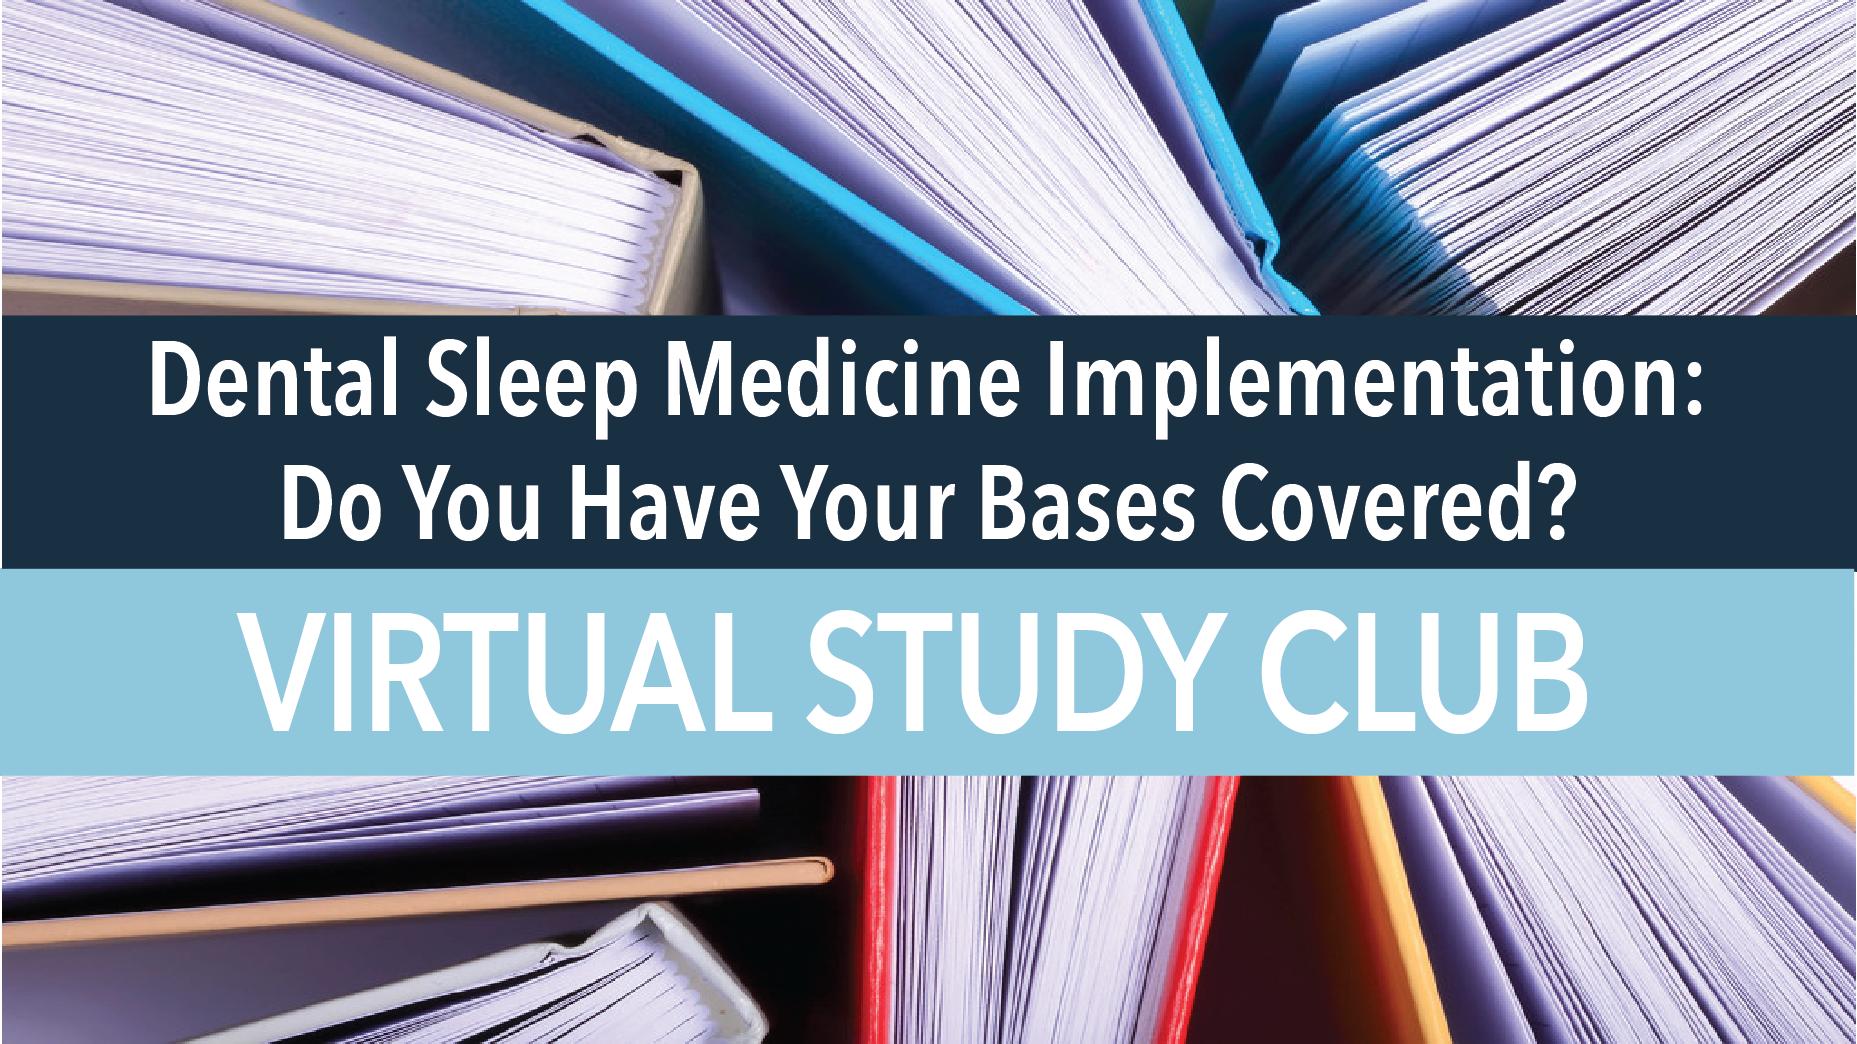 Dental Sleep Medicine Implementation- Do You Have Your Bases Covered?.png